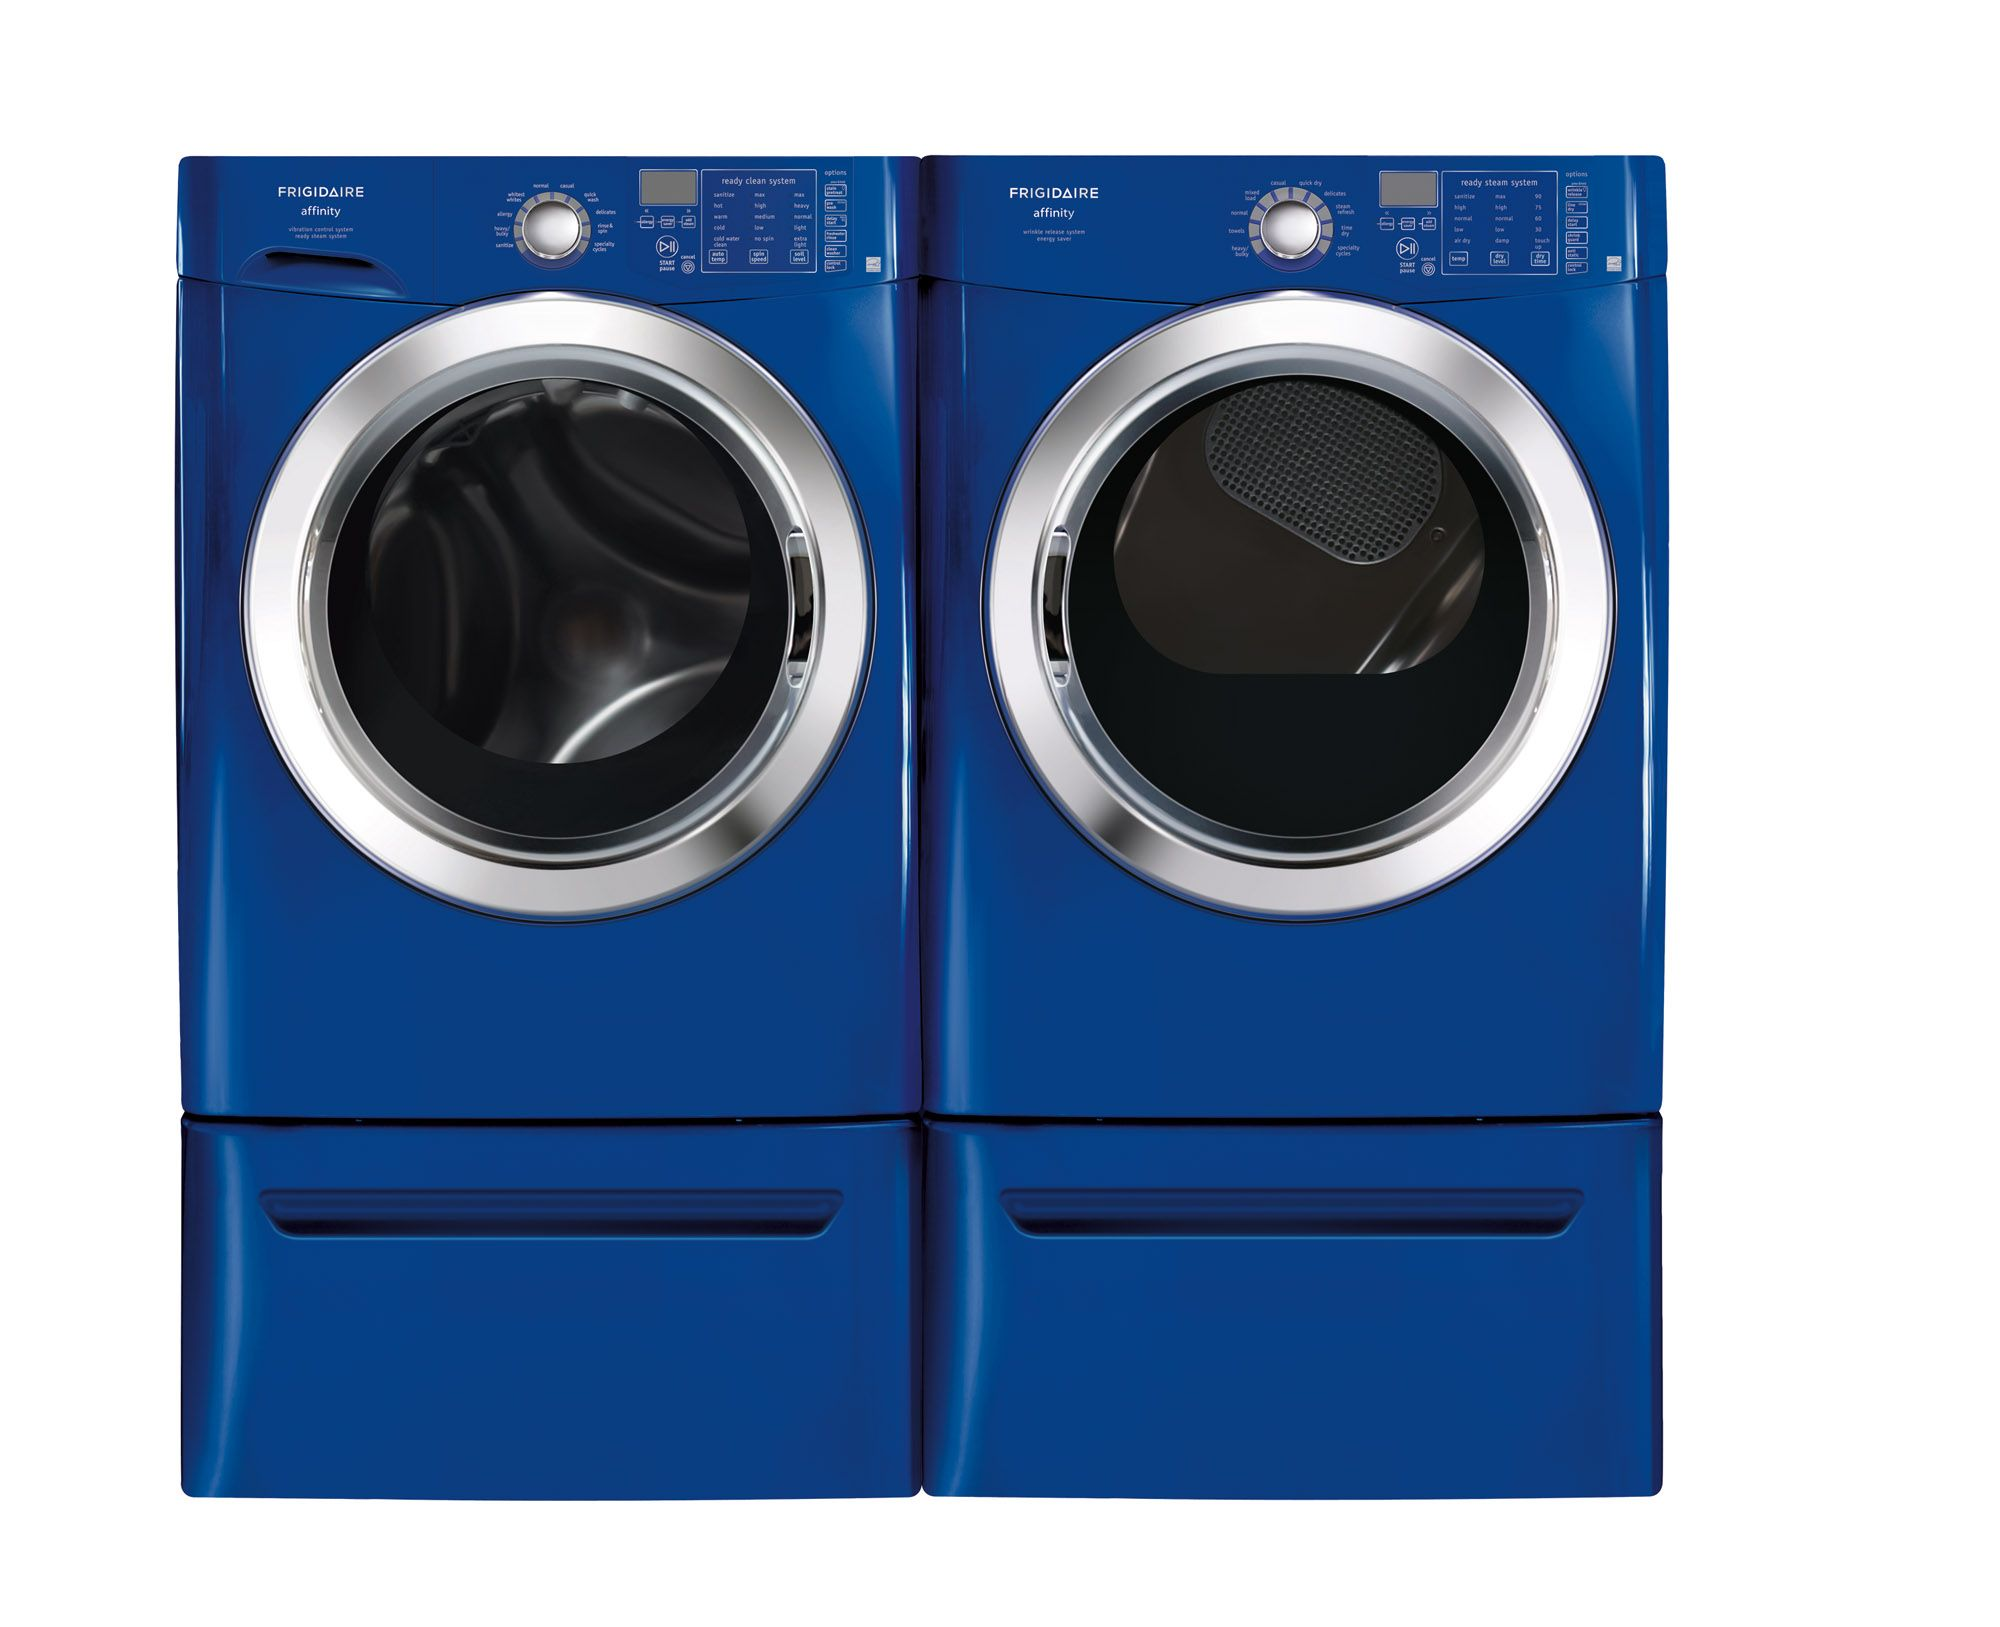 electrolux titanium laundry bin ajmadison cgi pedestal